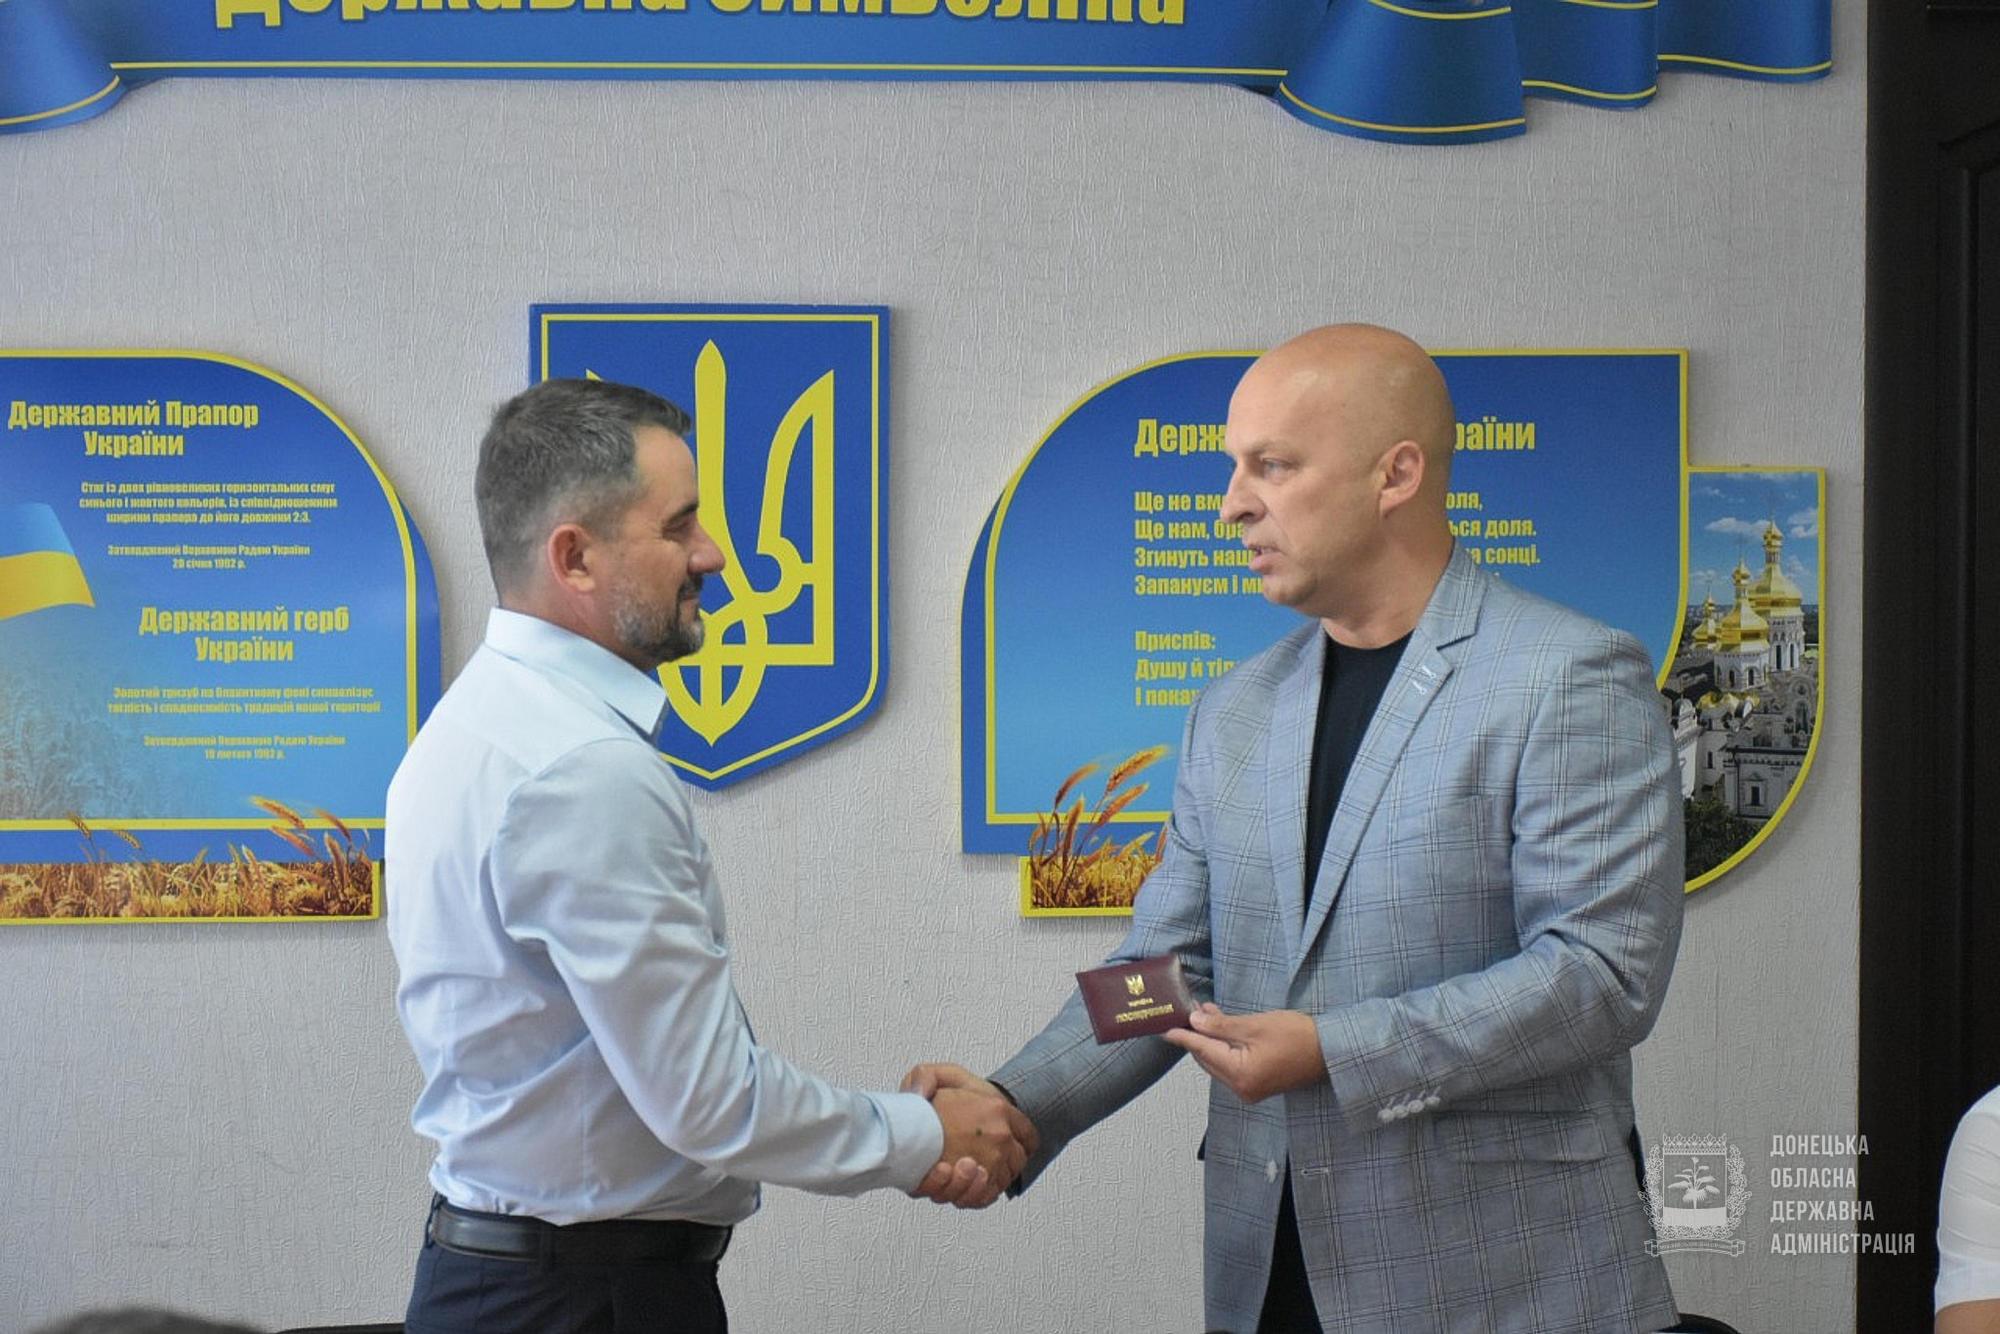 Вадима Ляха назначили главой Славянской ВЦА